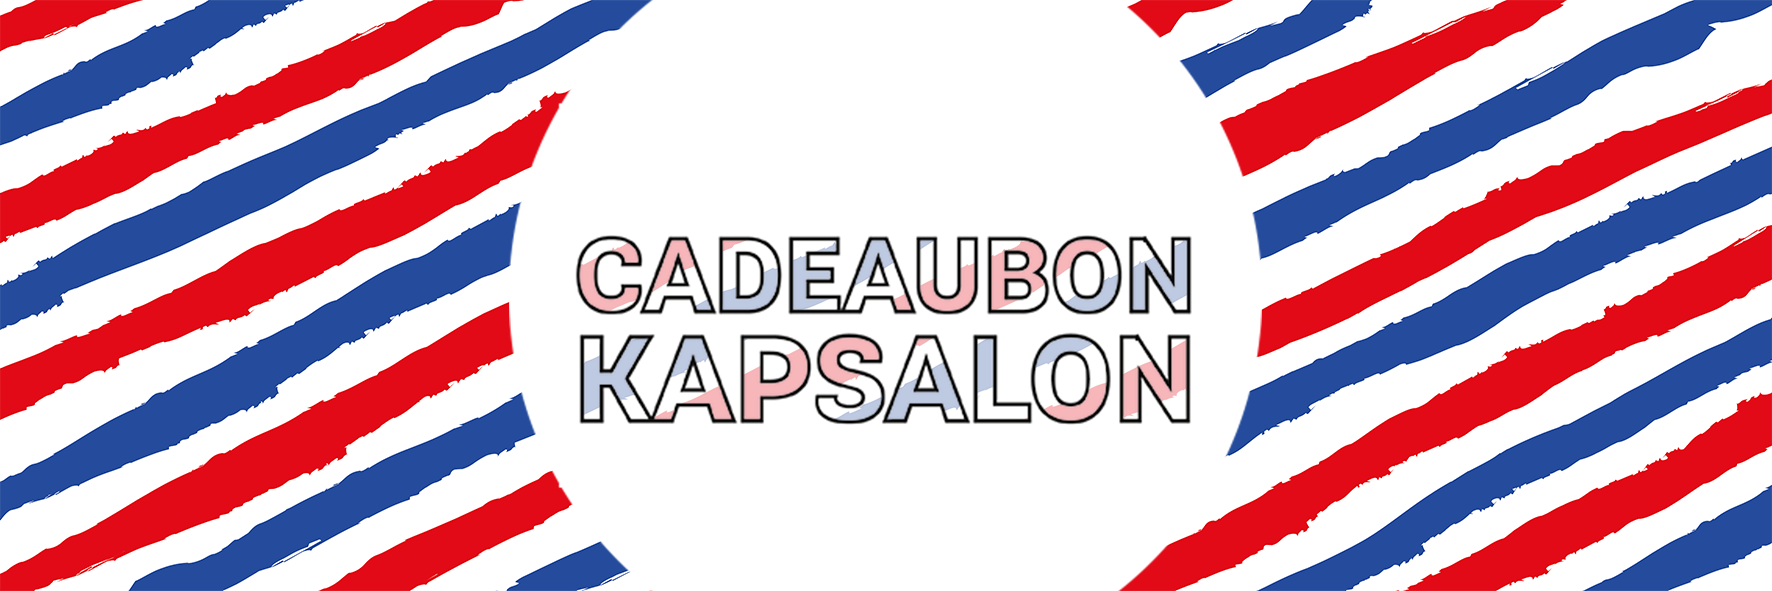 Cadeaubon-Kapsalon